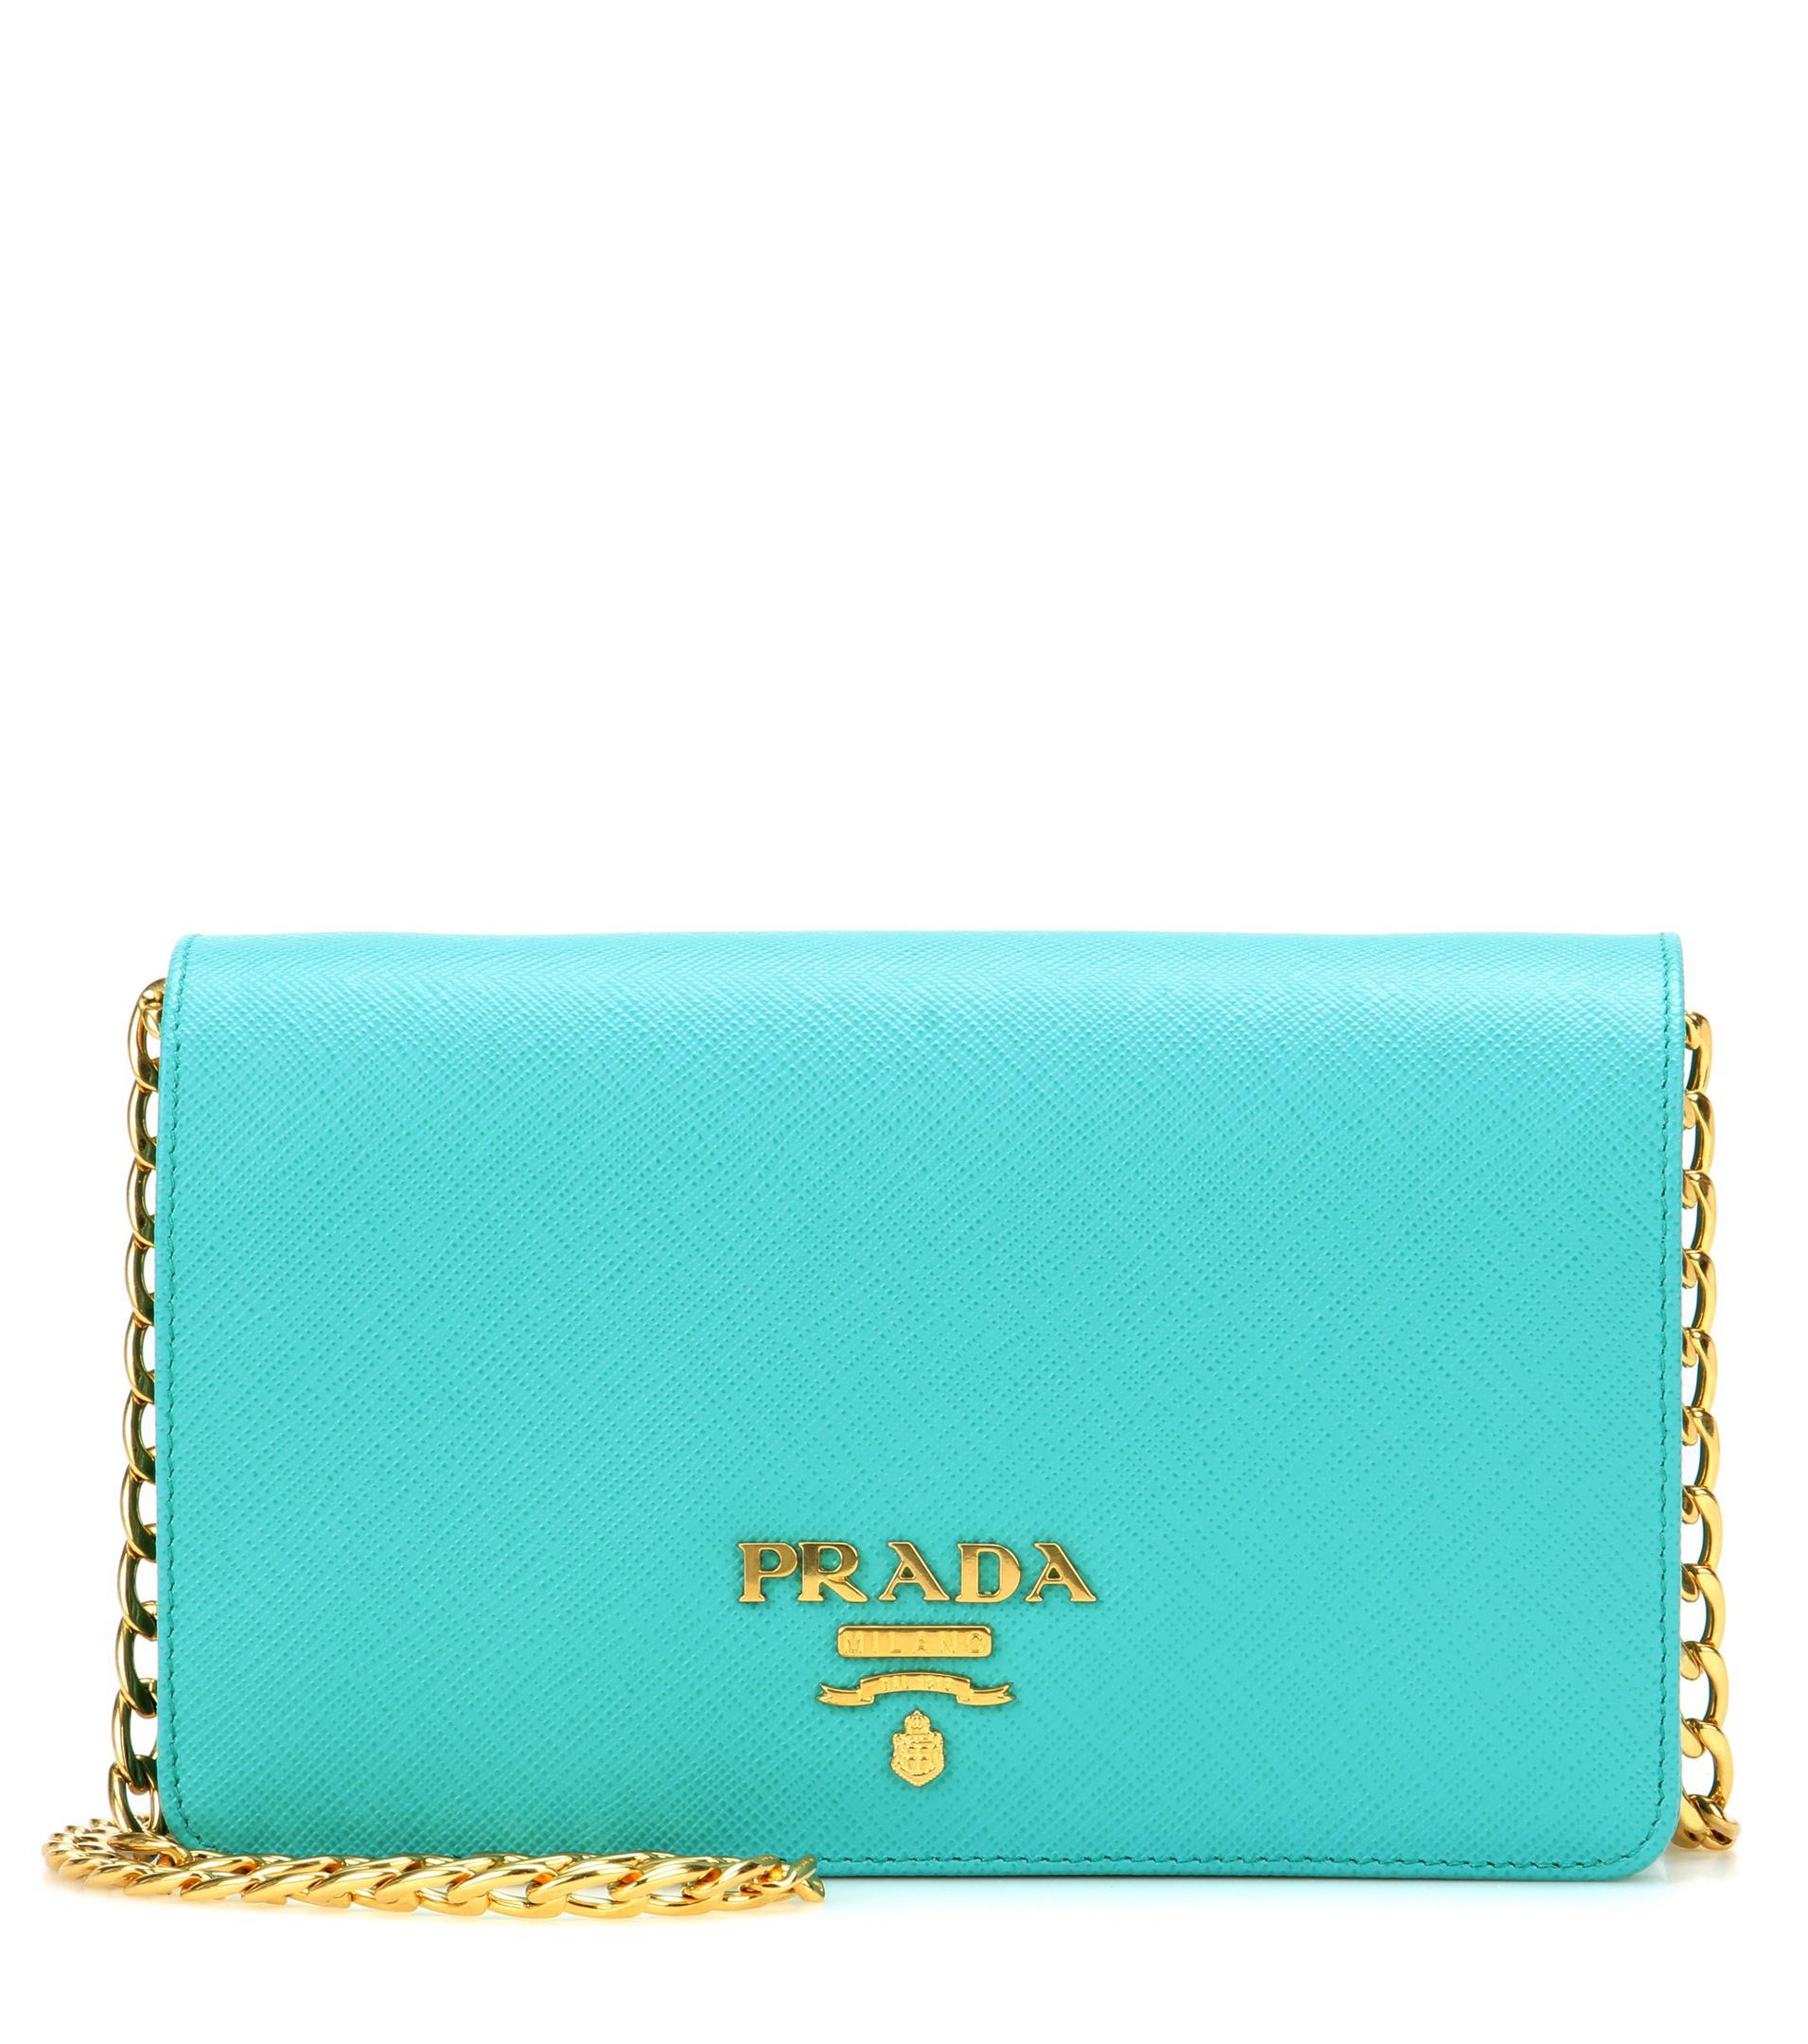 f0240b02685c Lyst - Prada Galleria Saffiano Lux Small Shoulder Bag in Green